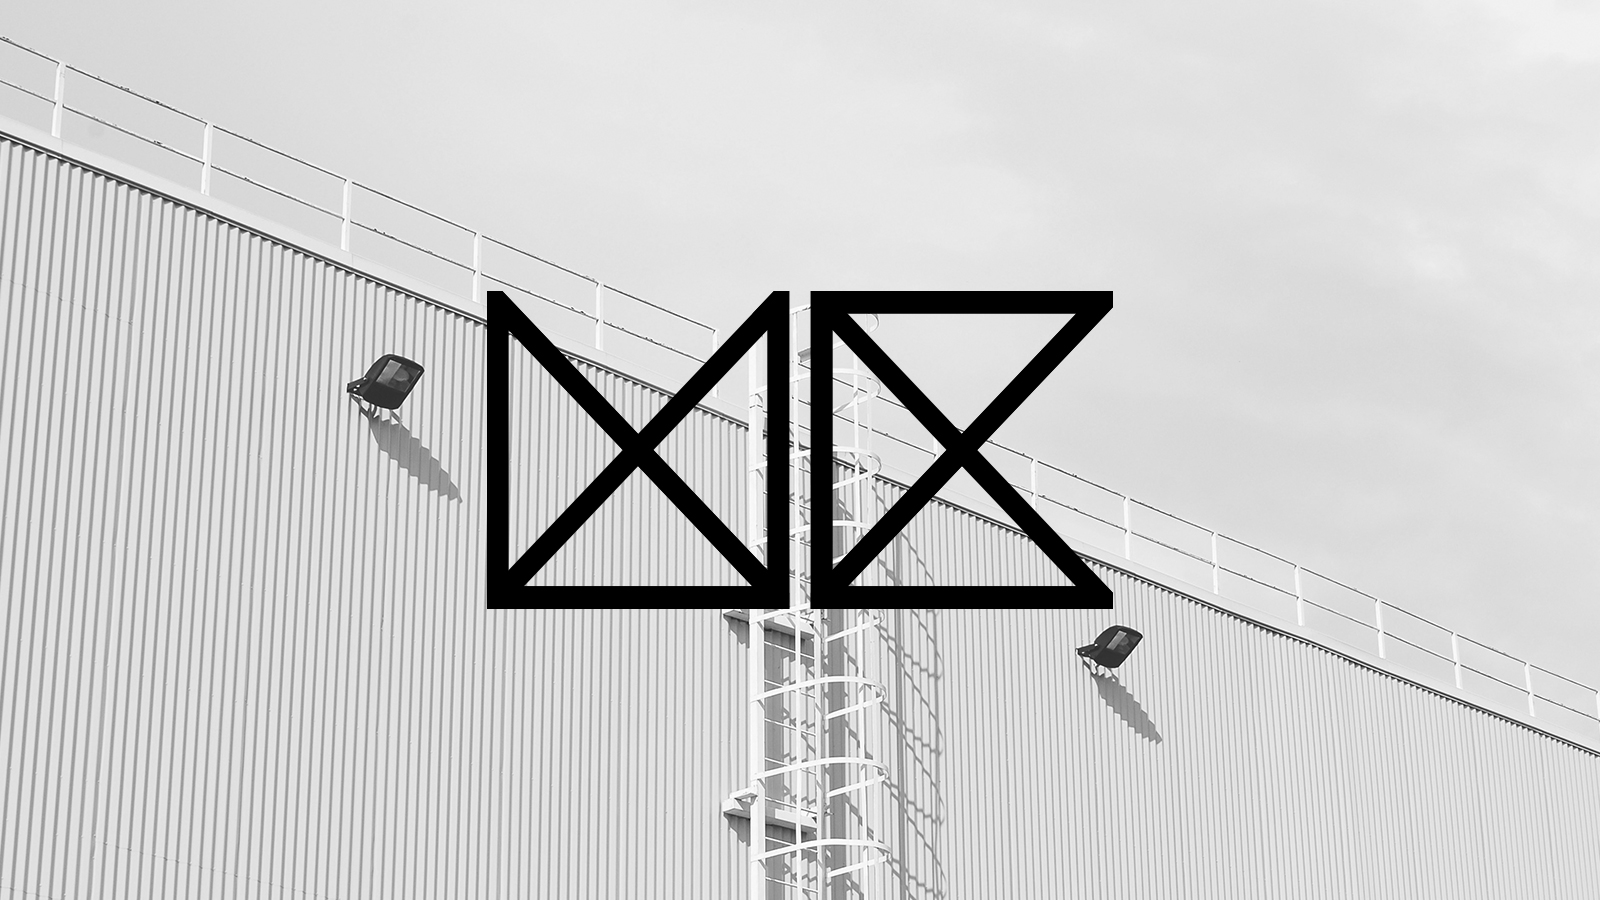 Merlin-Centre-Building-Logo-by-ALSO_Agency-06.jpg